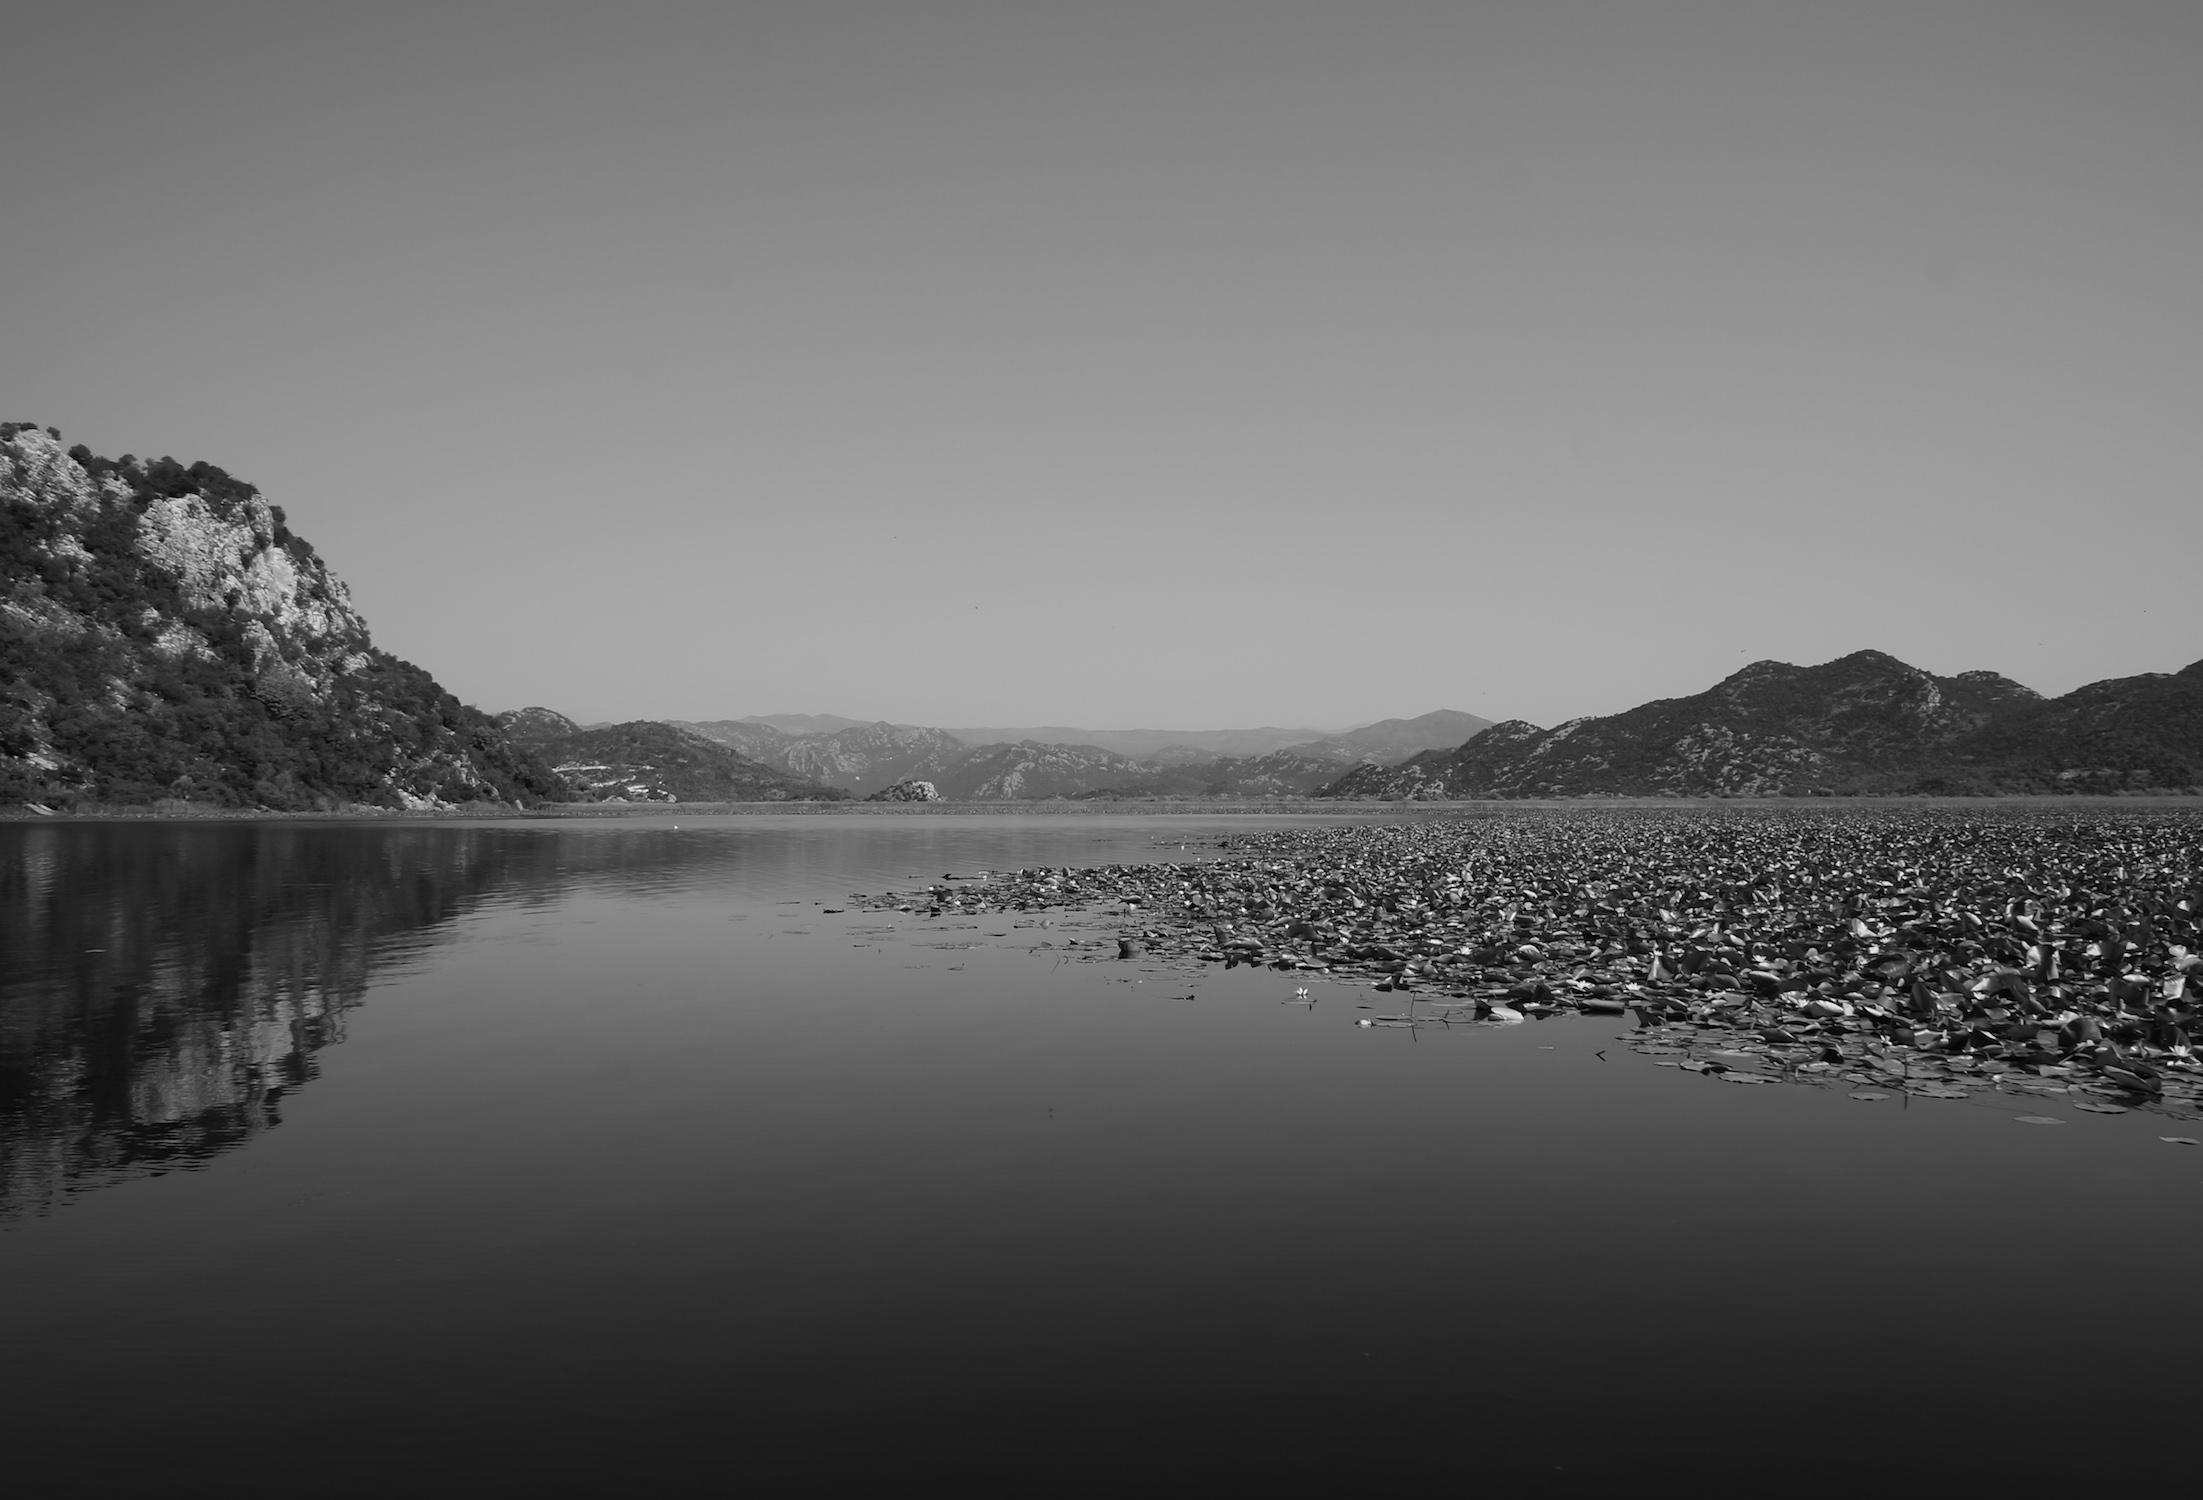 Skhodar Lake view, Montenegro